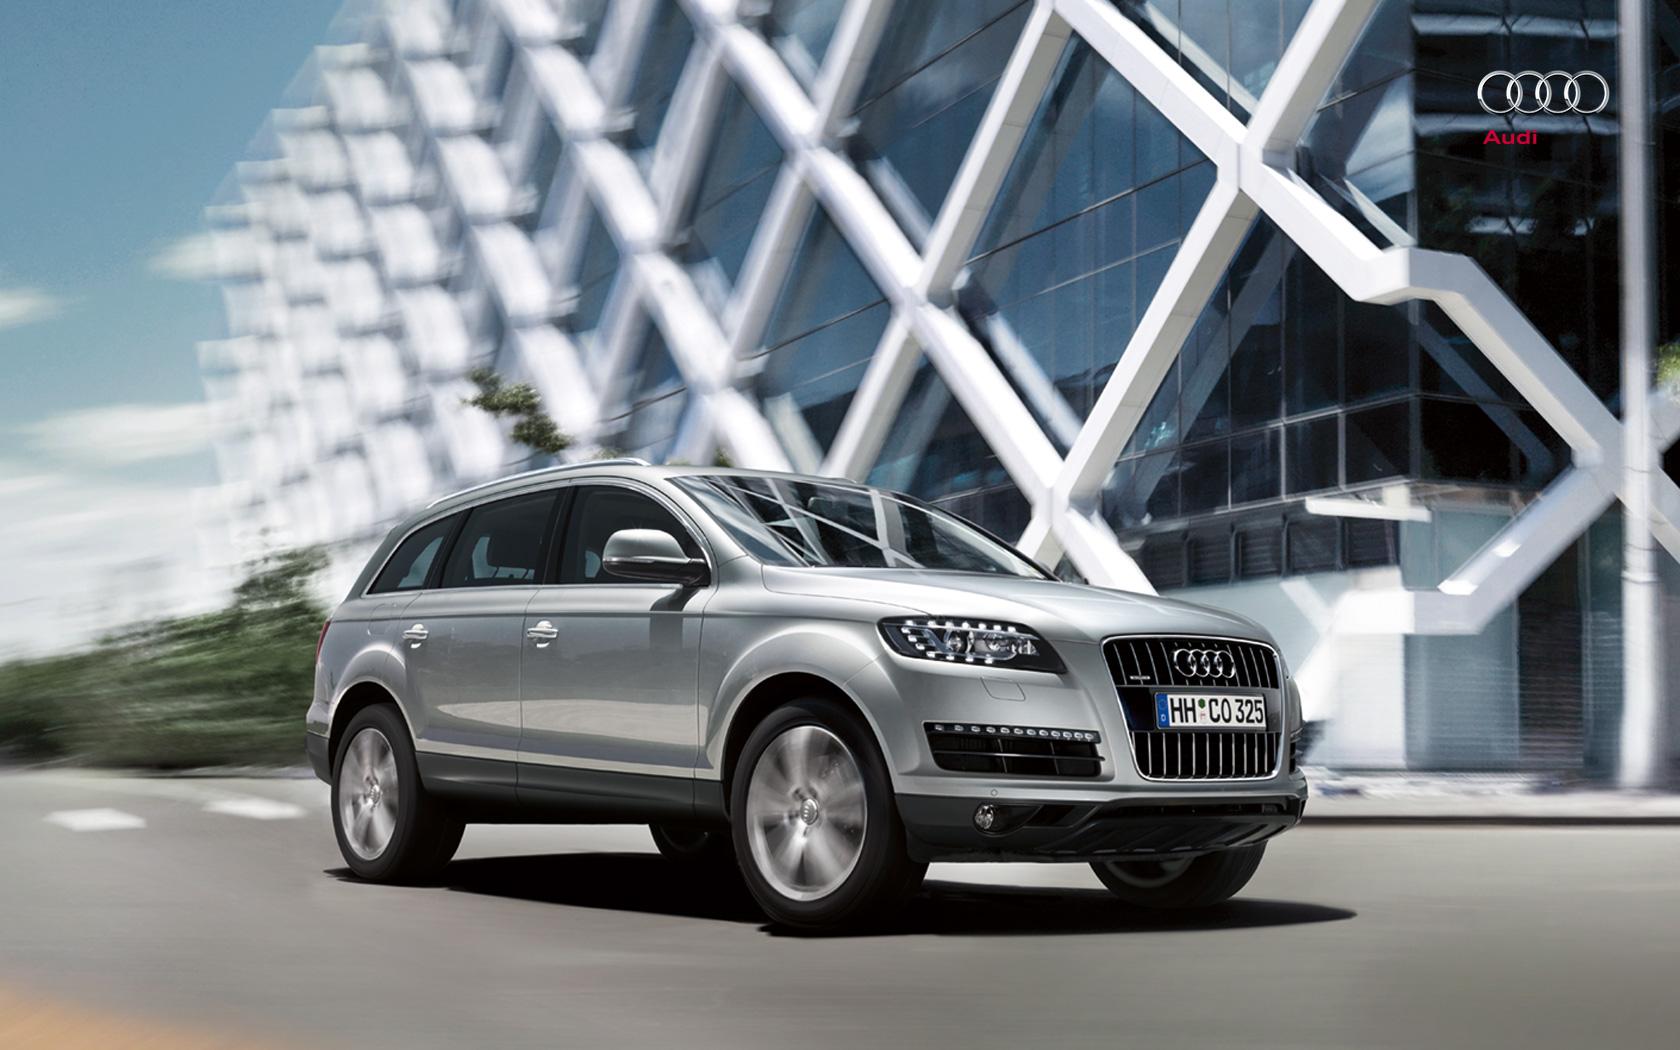 audi wallpaper (Audi Q7)